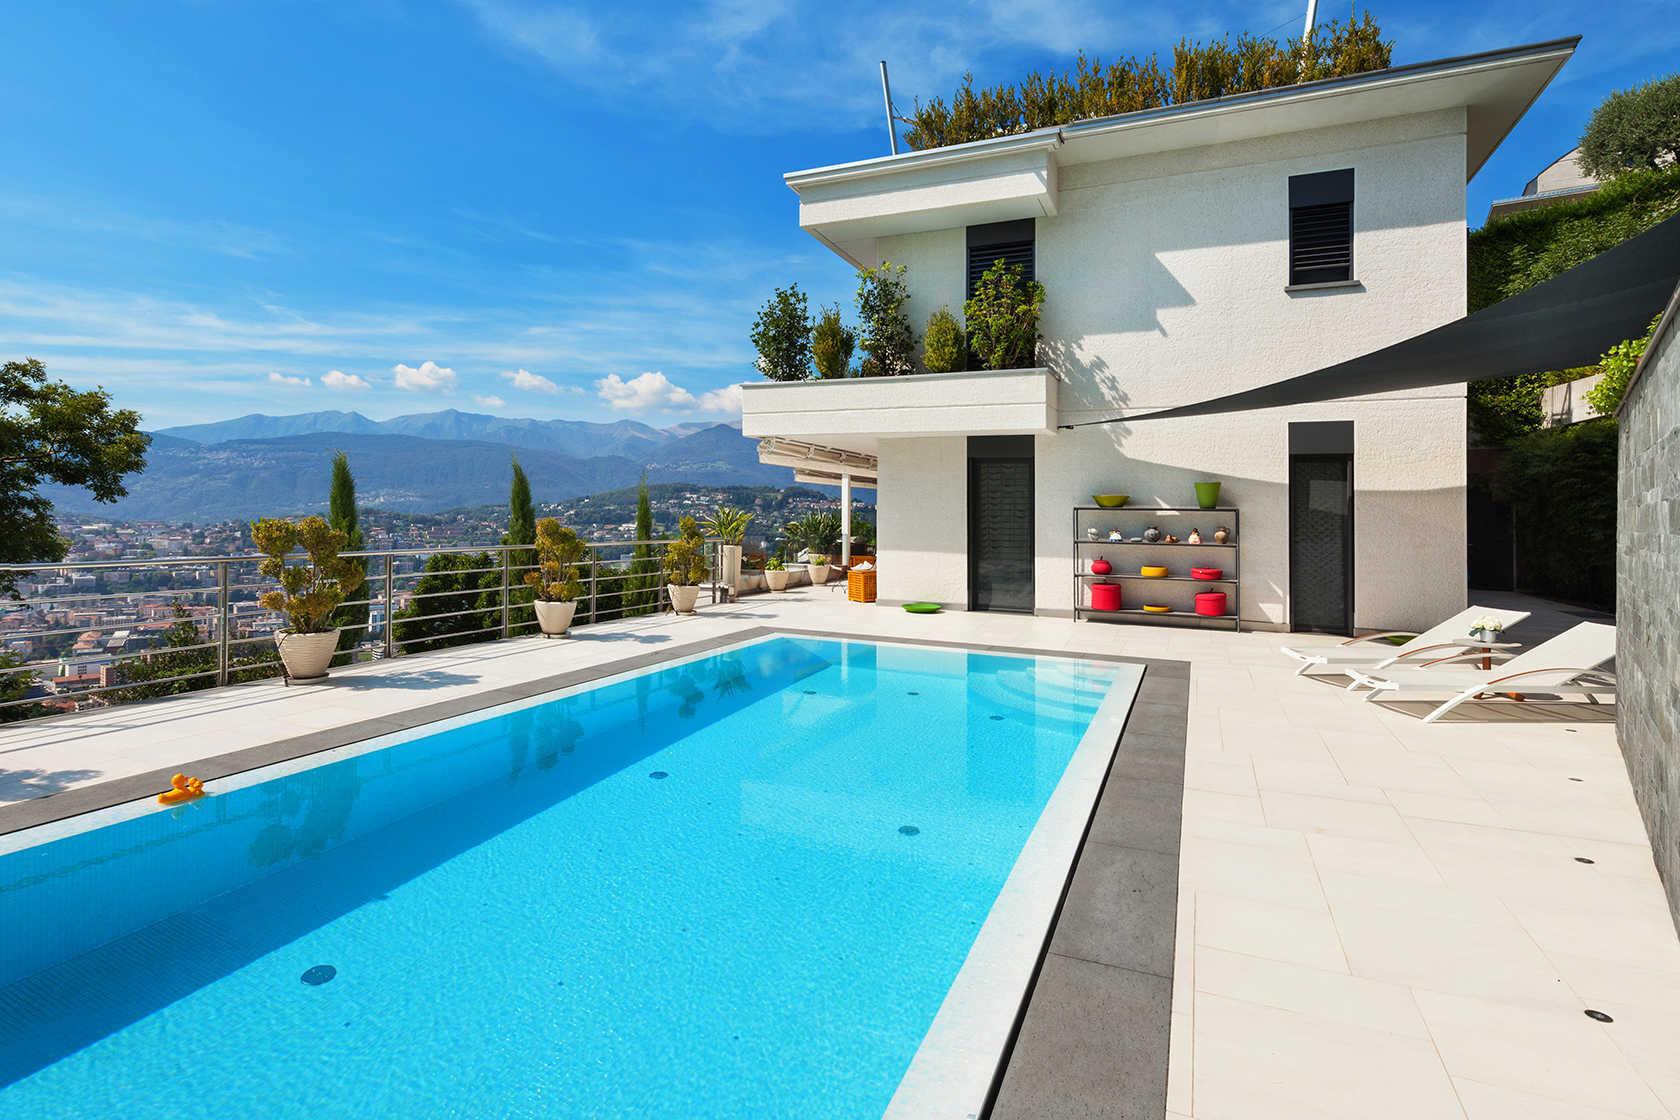 Gran piscina rectangular dos tumbonas y vivienda de fondo